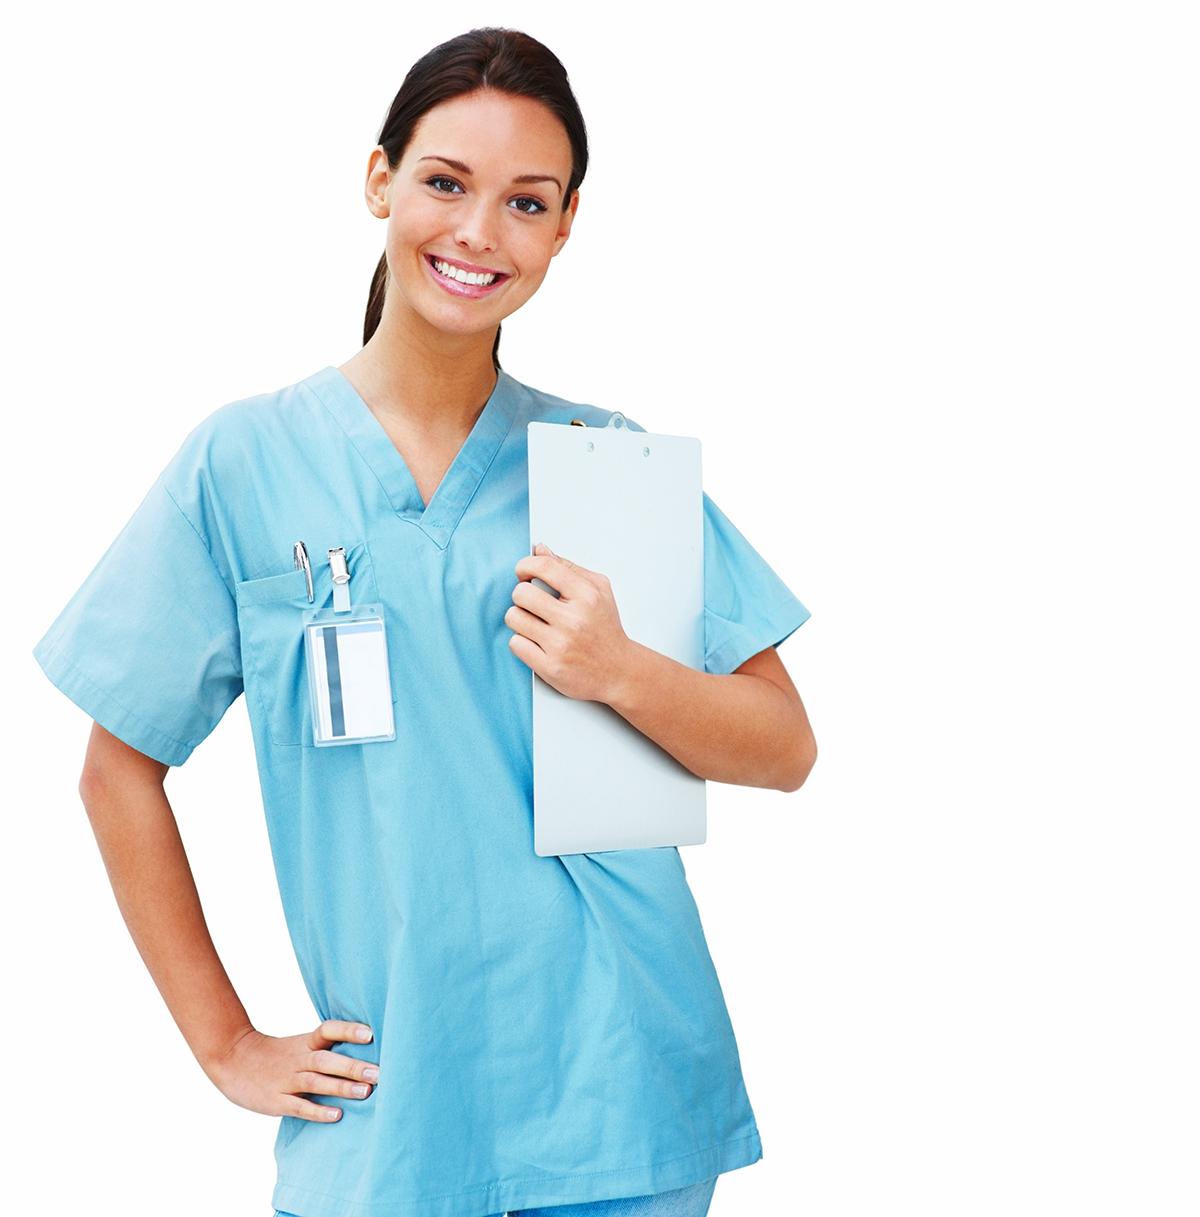 Nurse Photos - ClipArt Best